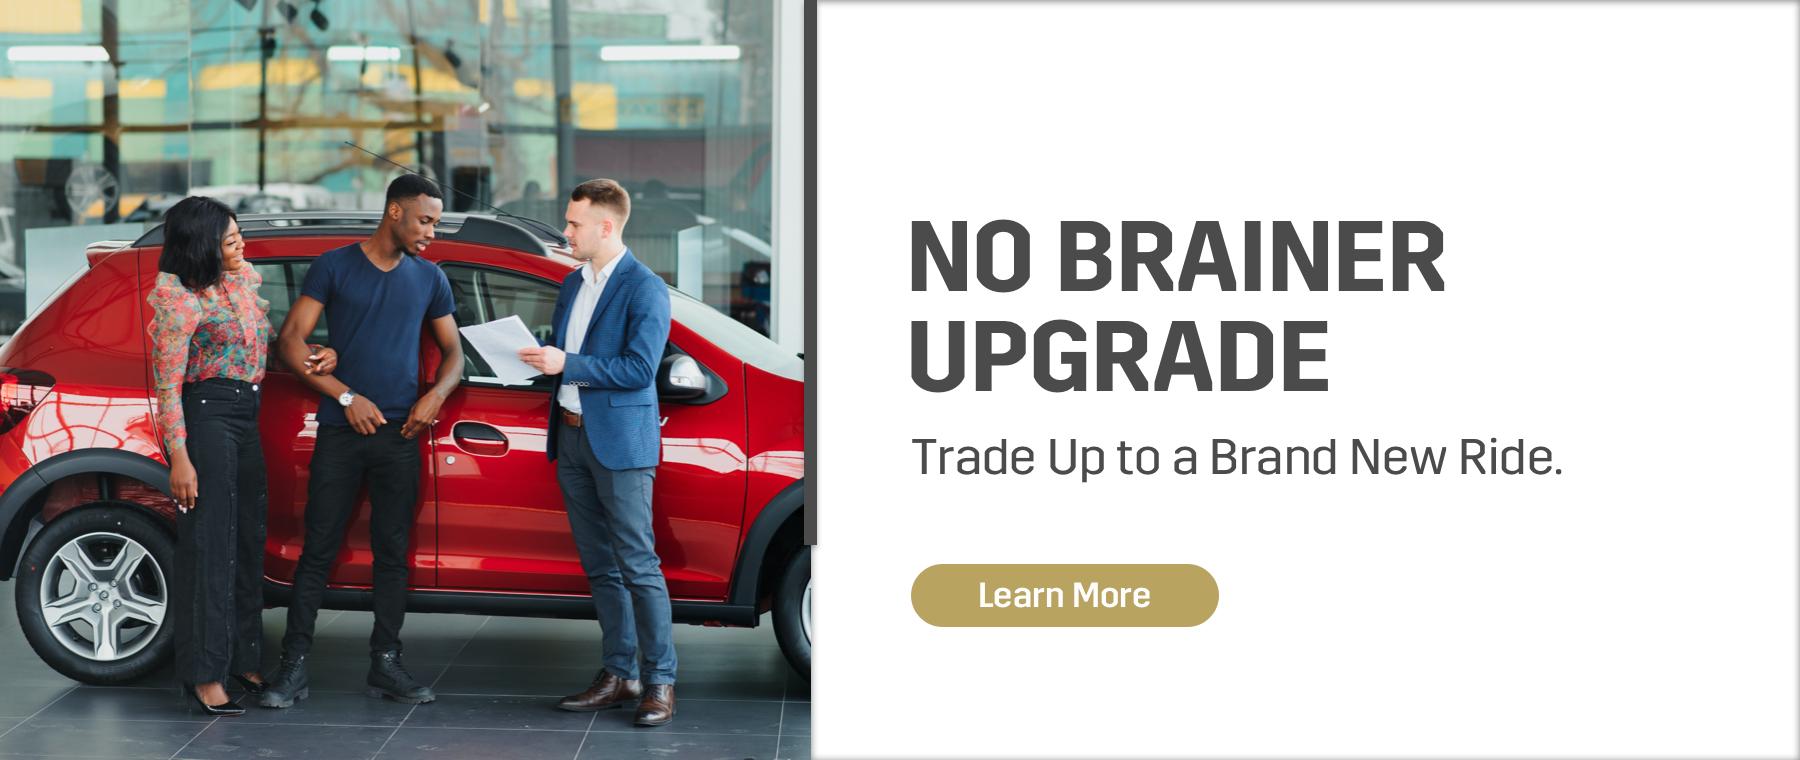 DGDG No Brainer Upgrade 1800×760